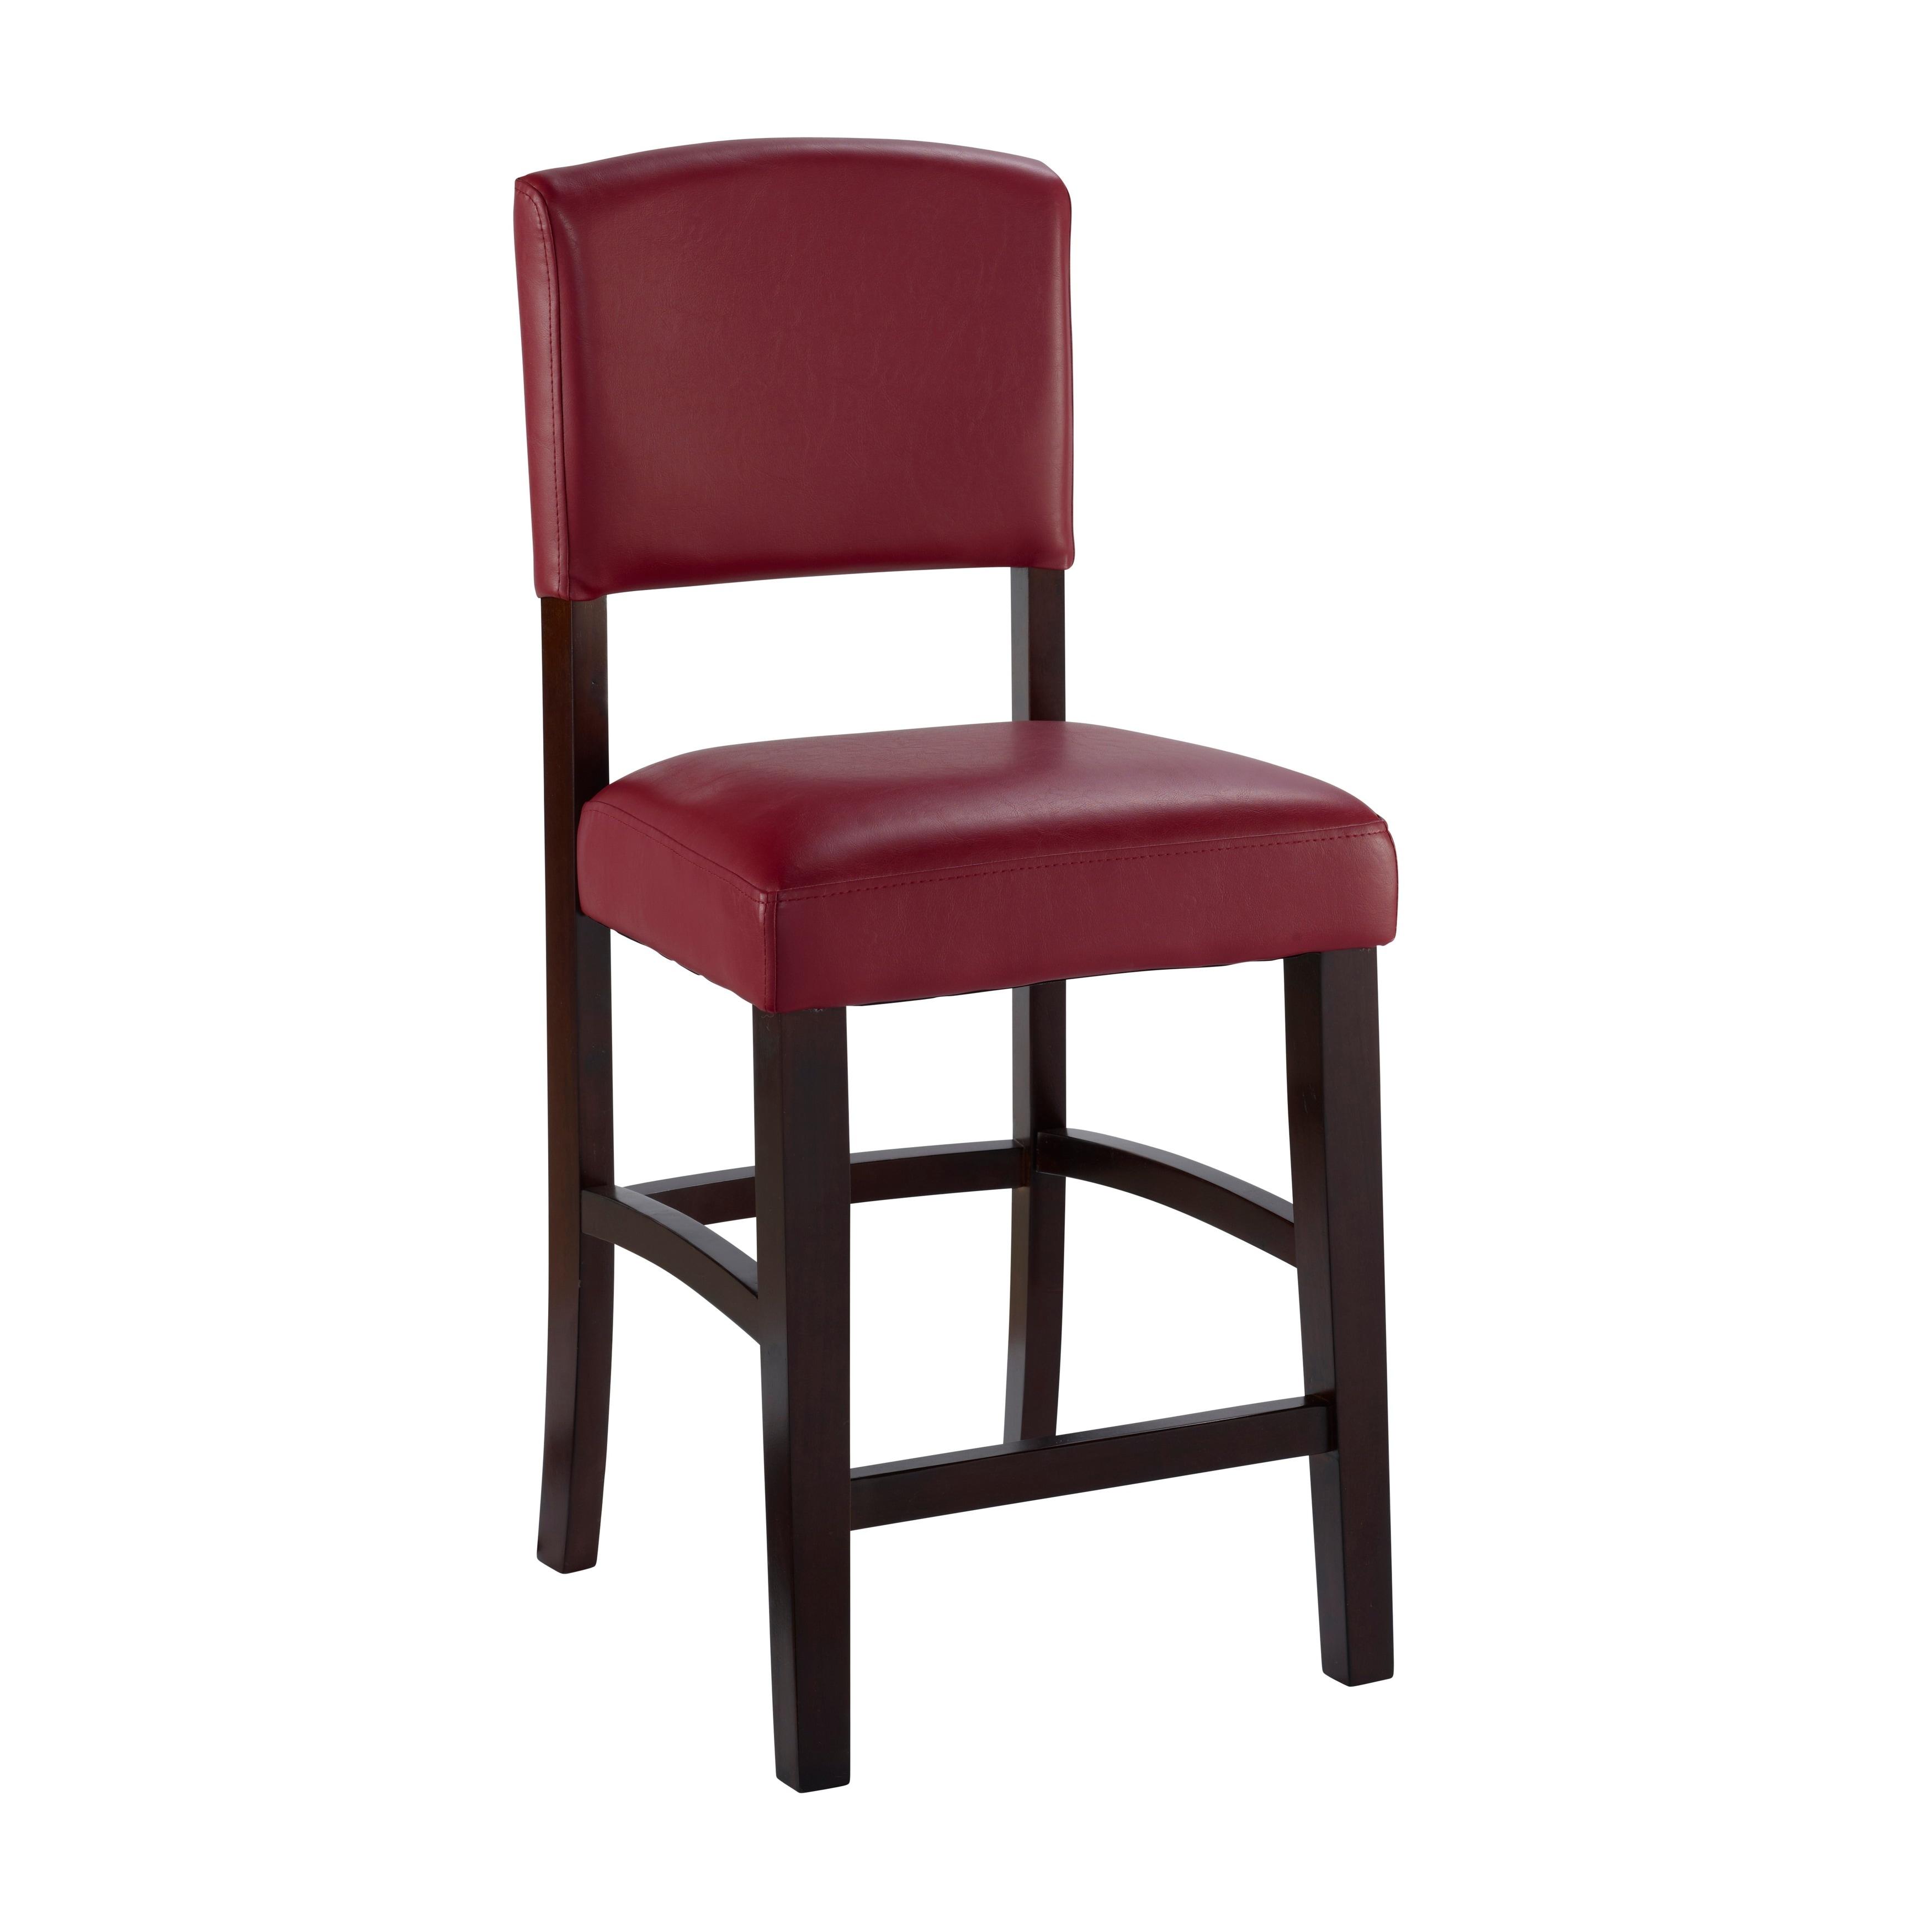 Groovy Linon Monte Carlo Stationary Bar Stool Dark Red Vinyl Unemploymentrelief Wooden Chair Designs For Living Room Unemploymentrelieforg